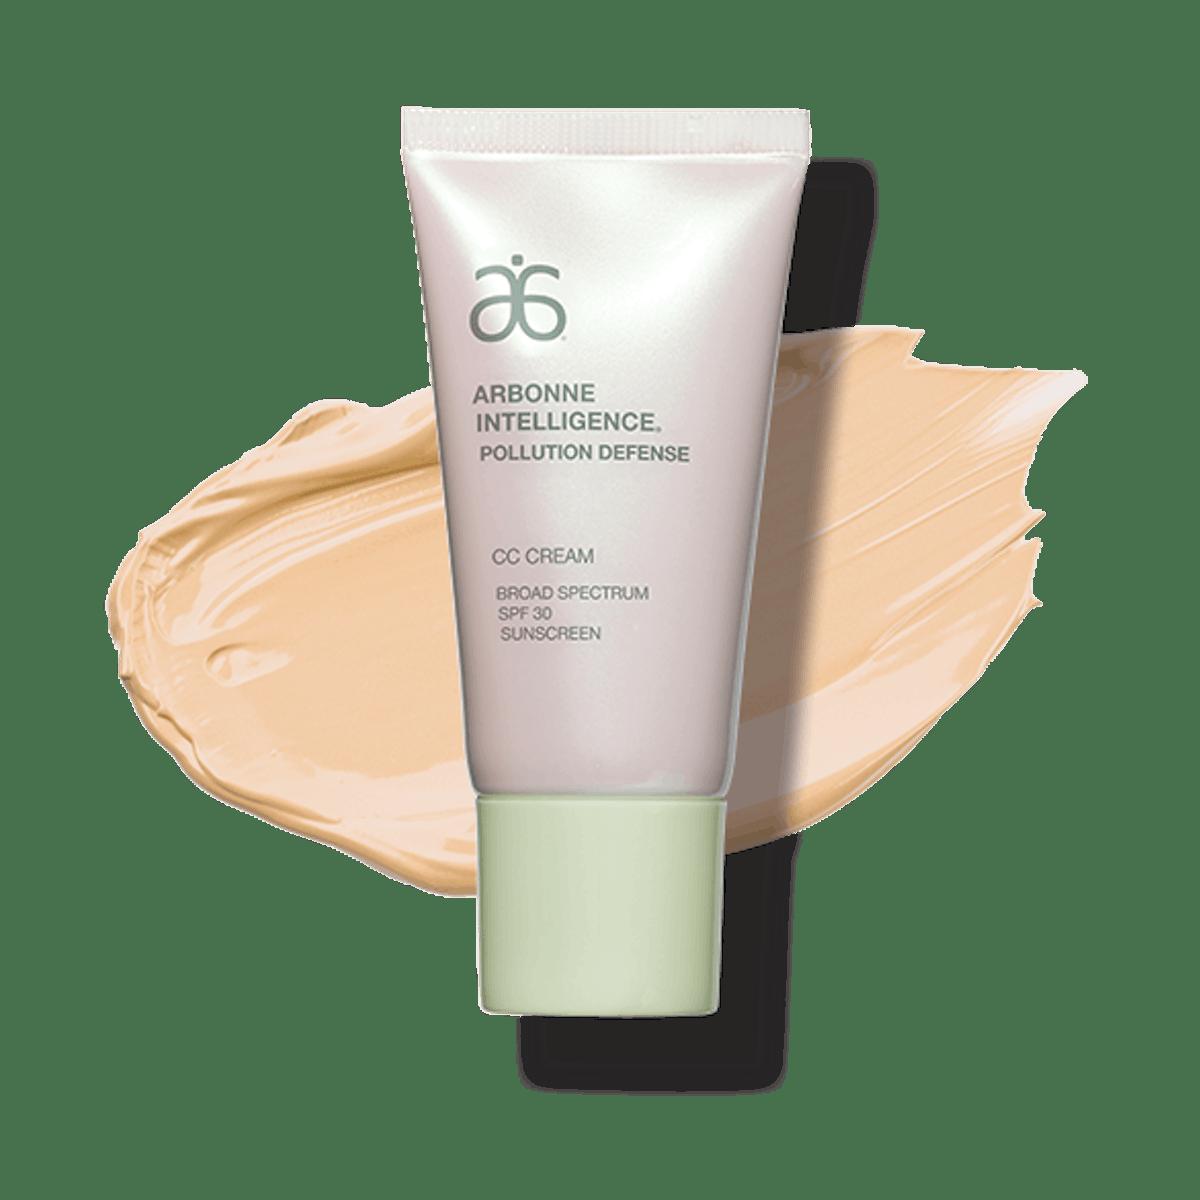 Arbonne Intelligence Pollution Defense CC Cream Broad Spectrum SPF 30 Sunscreen